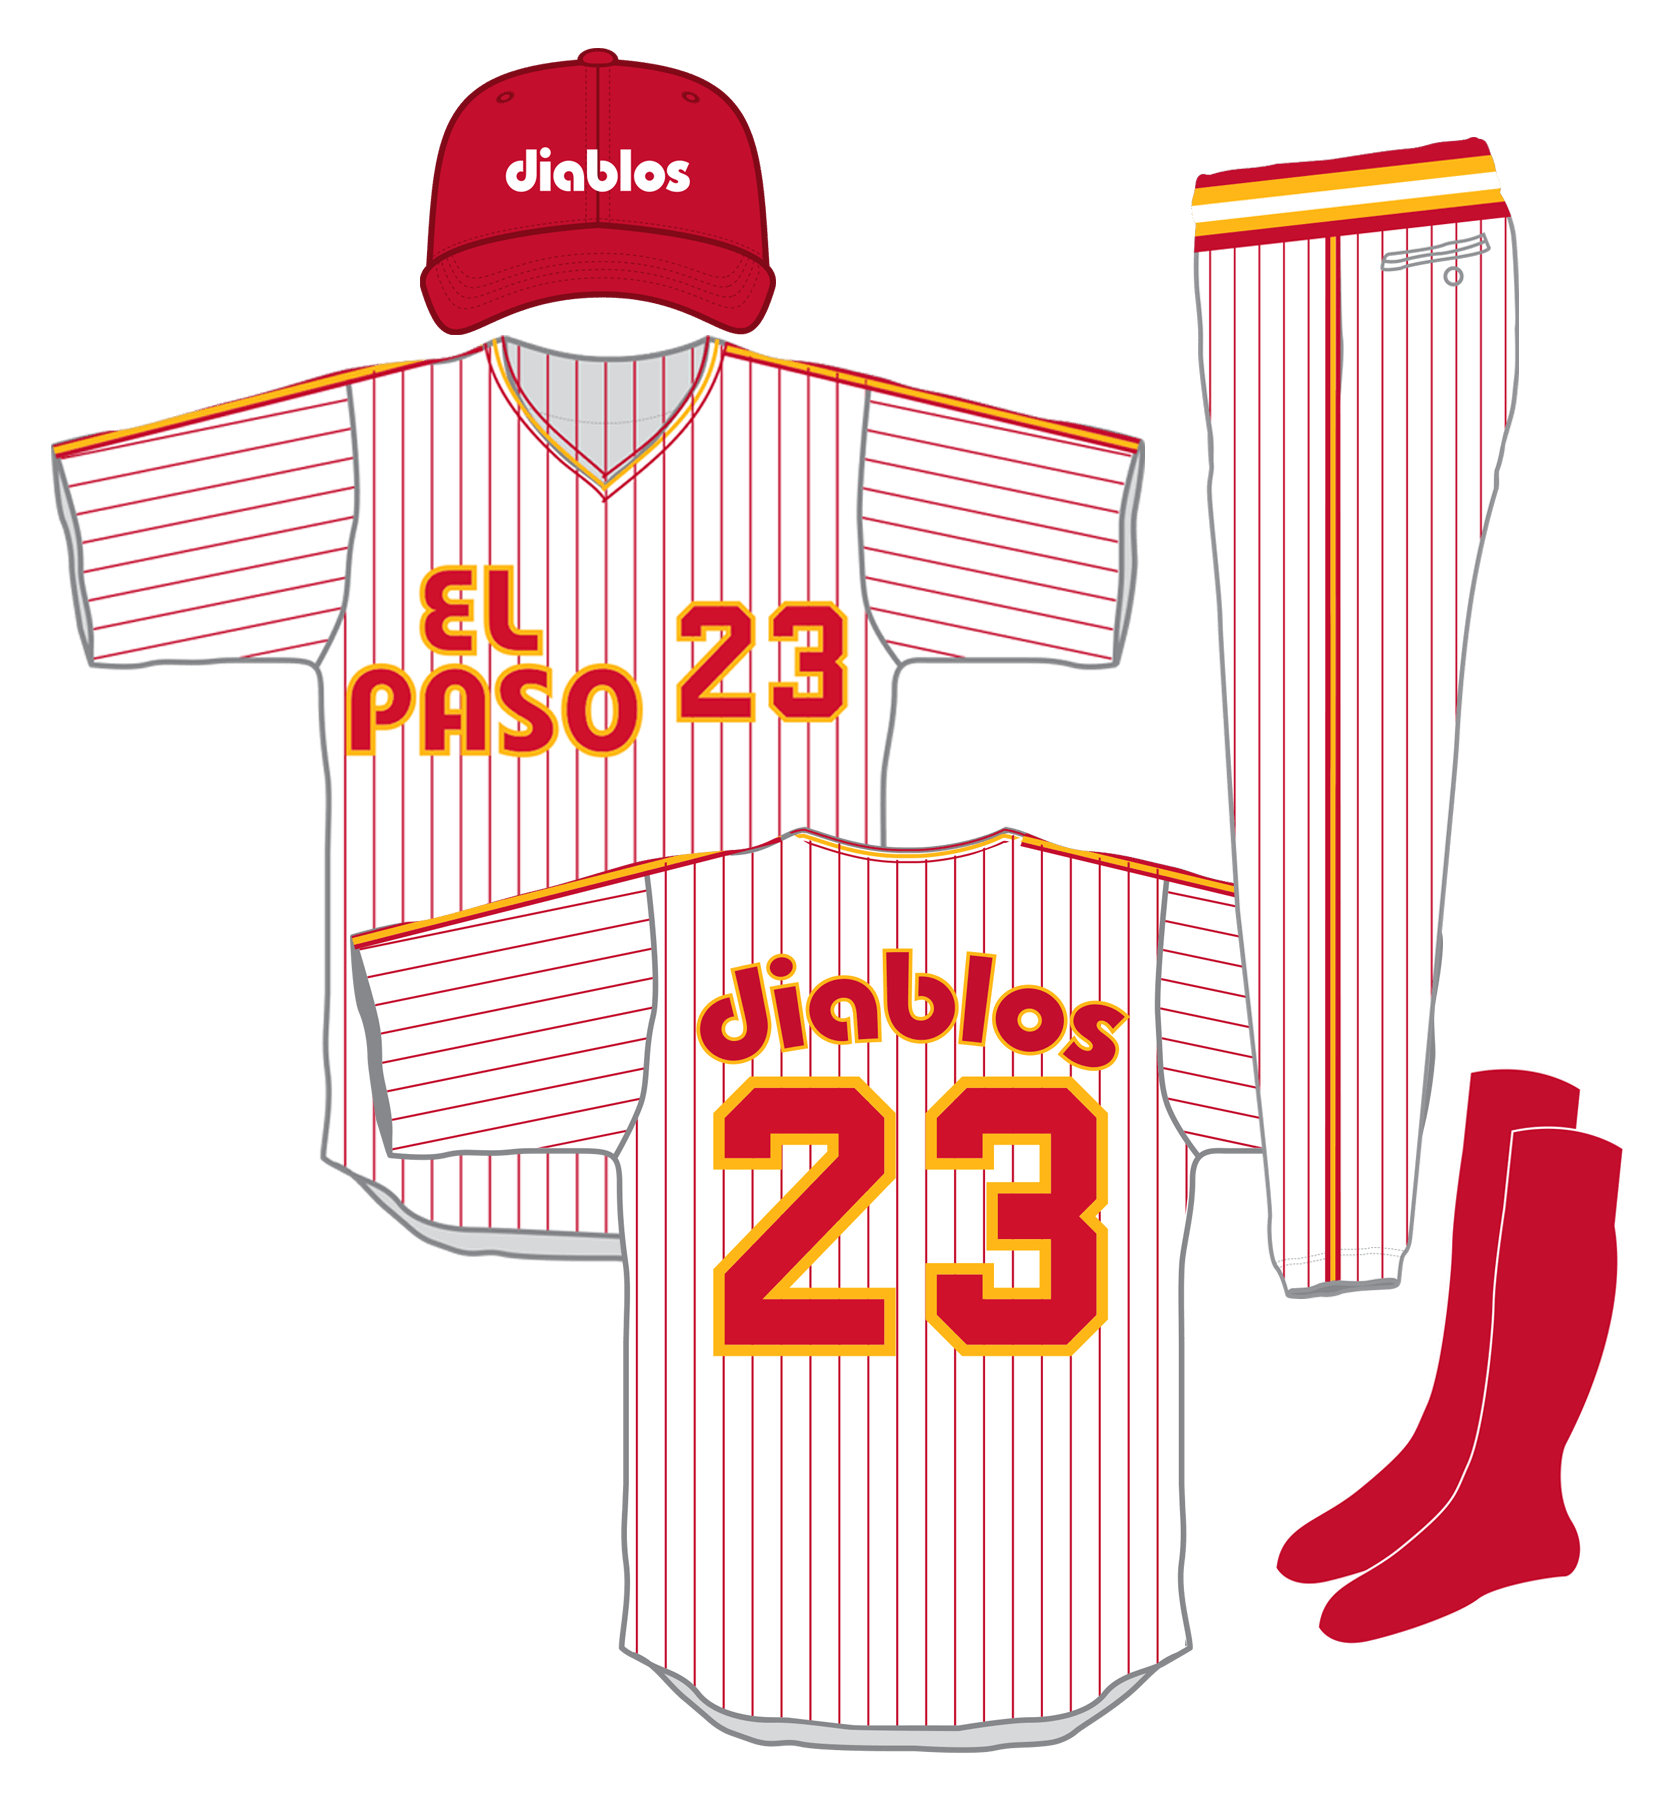 Baseball stadium advertising clipart image royalty free Wednesday, El Paso Diablos day – The Dutch Baseball Hangout image royalty free